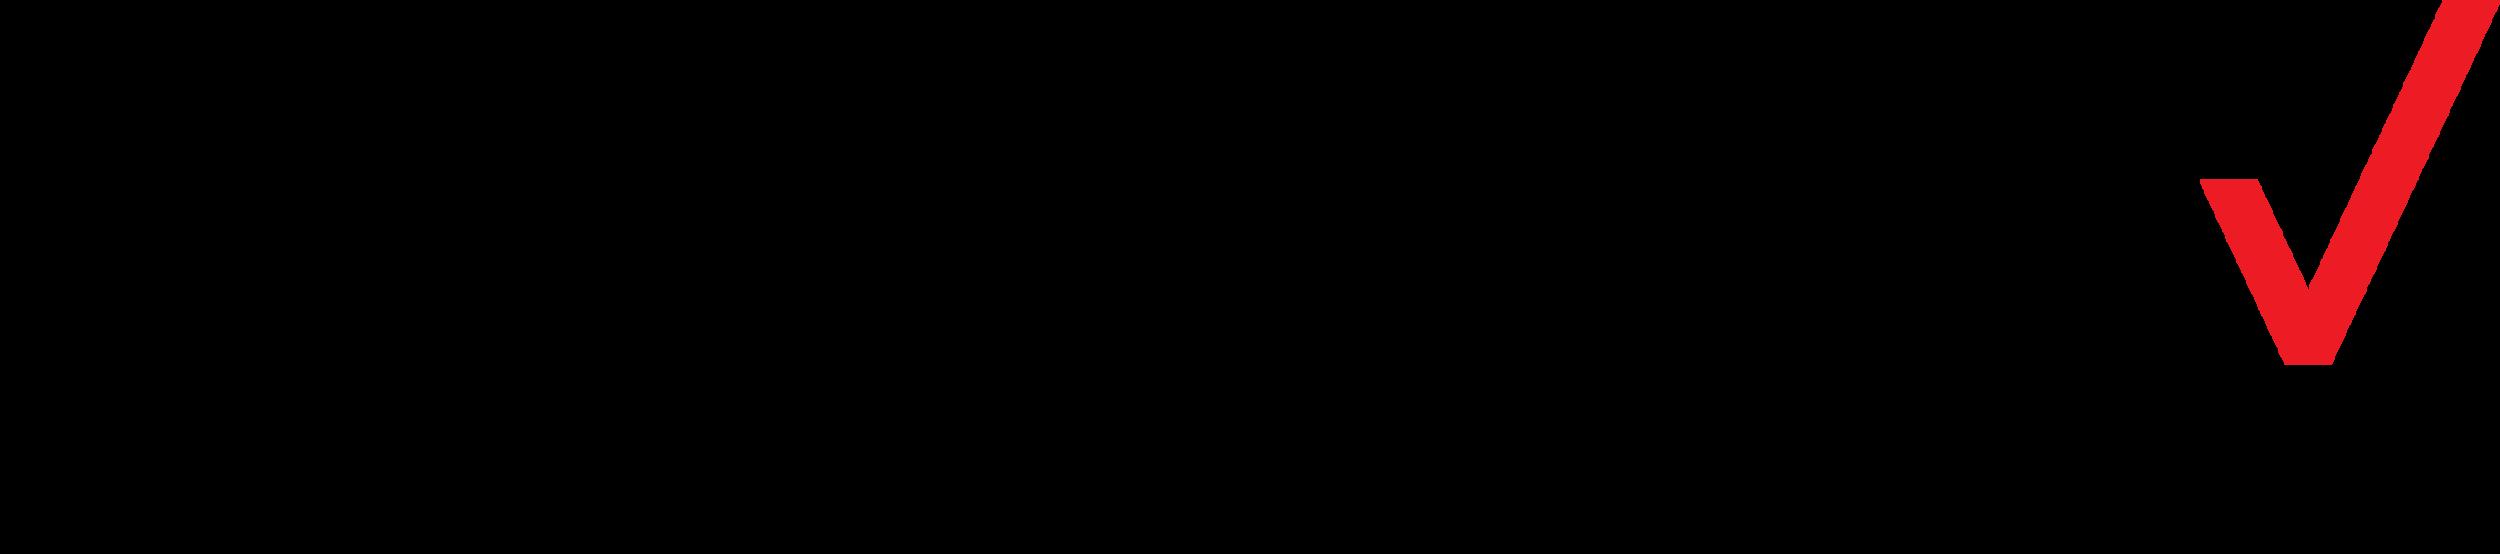 Verizon 2018.png